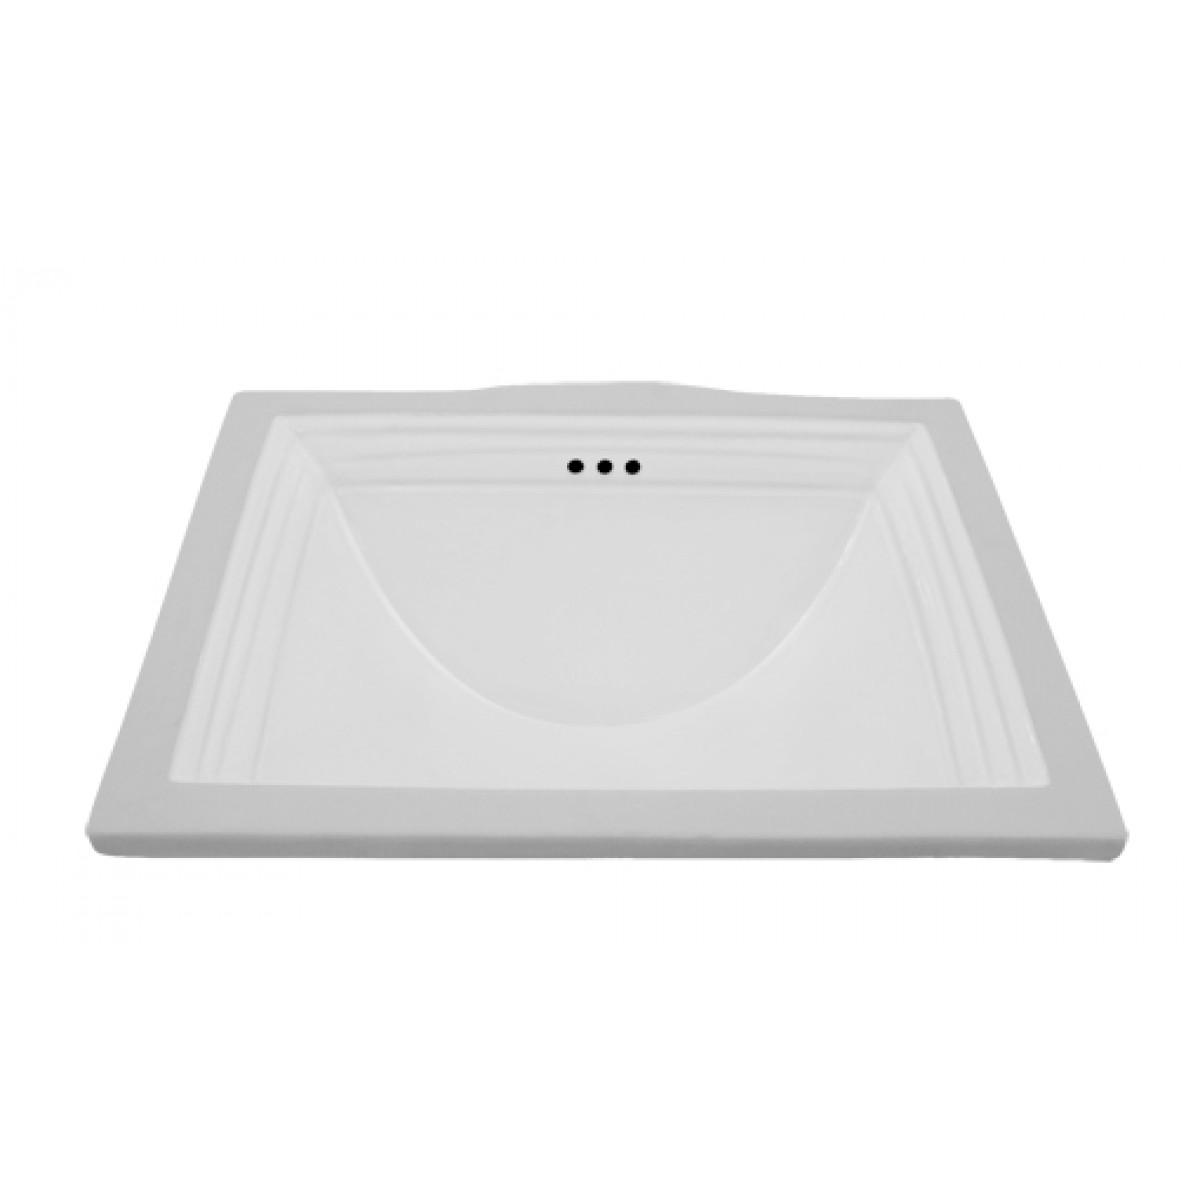 Rectangular White Porcelain Ceramic Vanity Undermount Bathroom ...